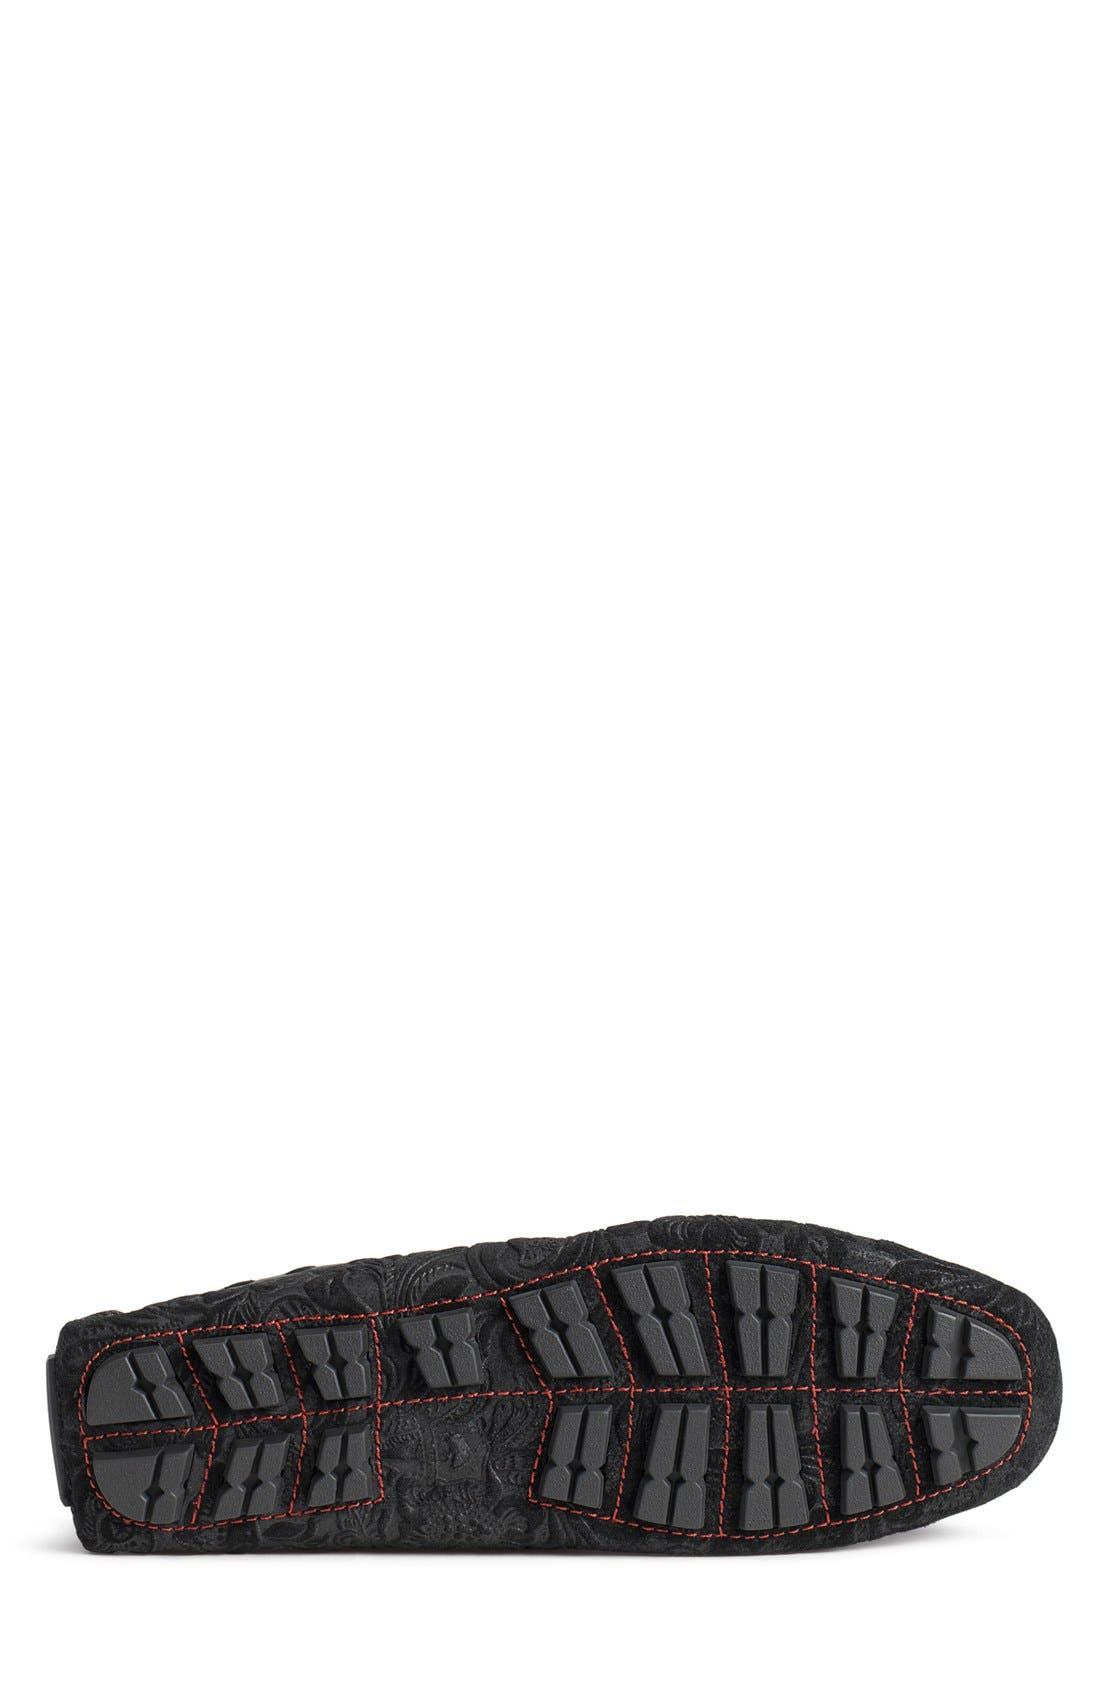 'Sophia' Genuine Shearling Lined Driving Loafer,                             Alternate thumbnail 3, color,                             008